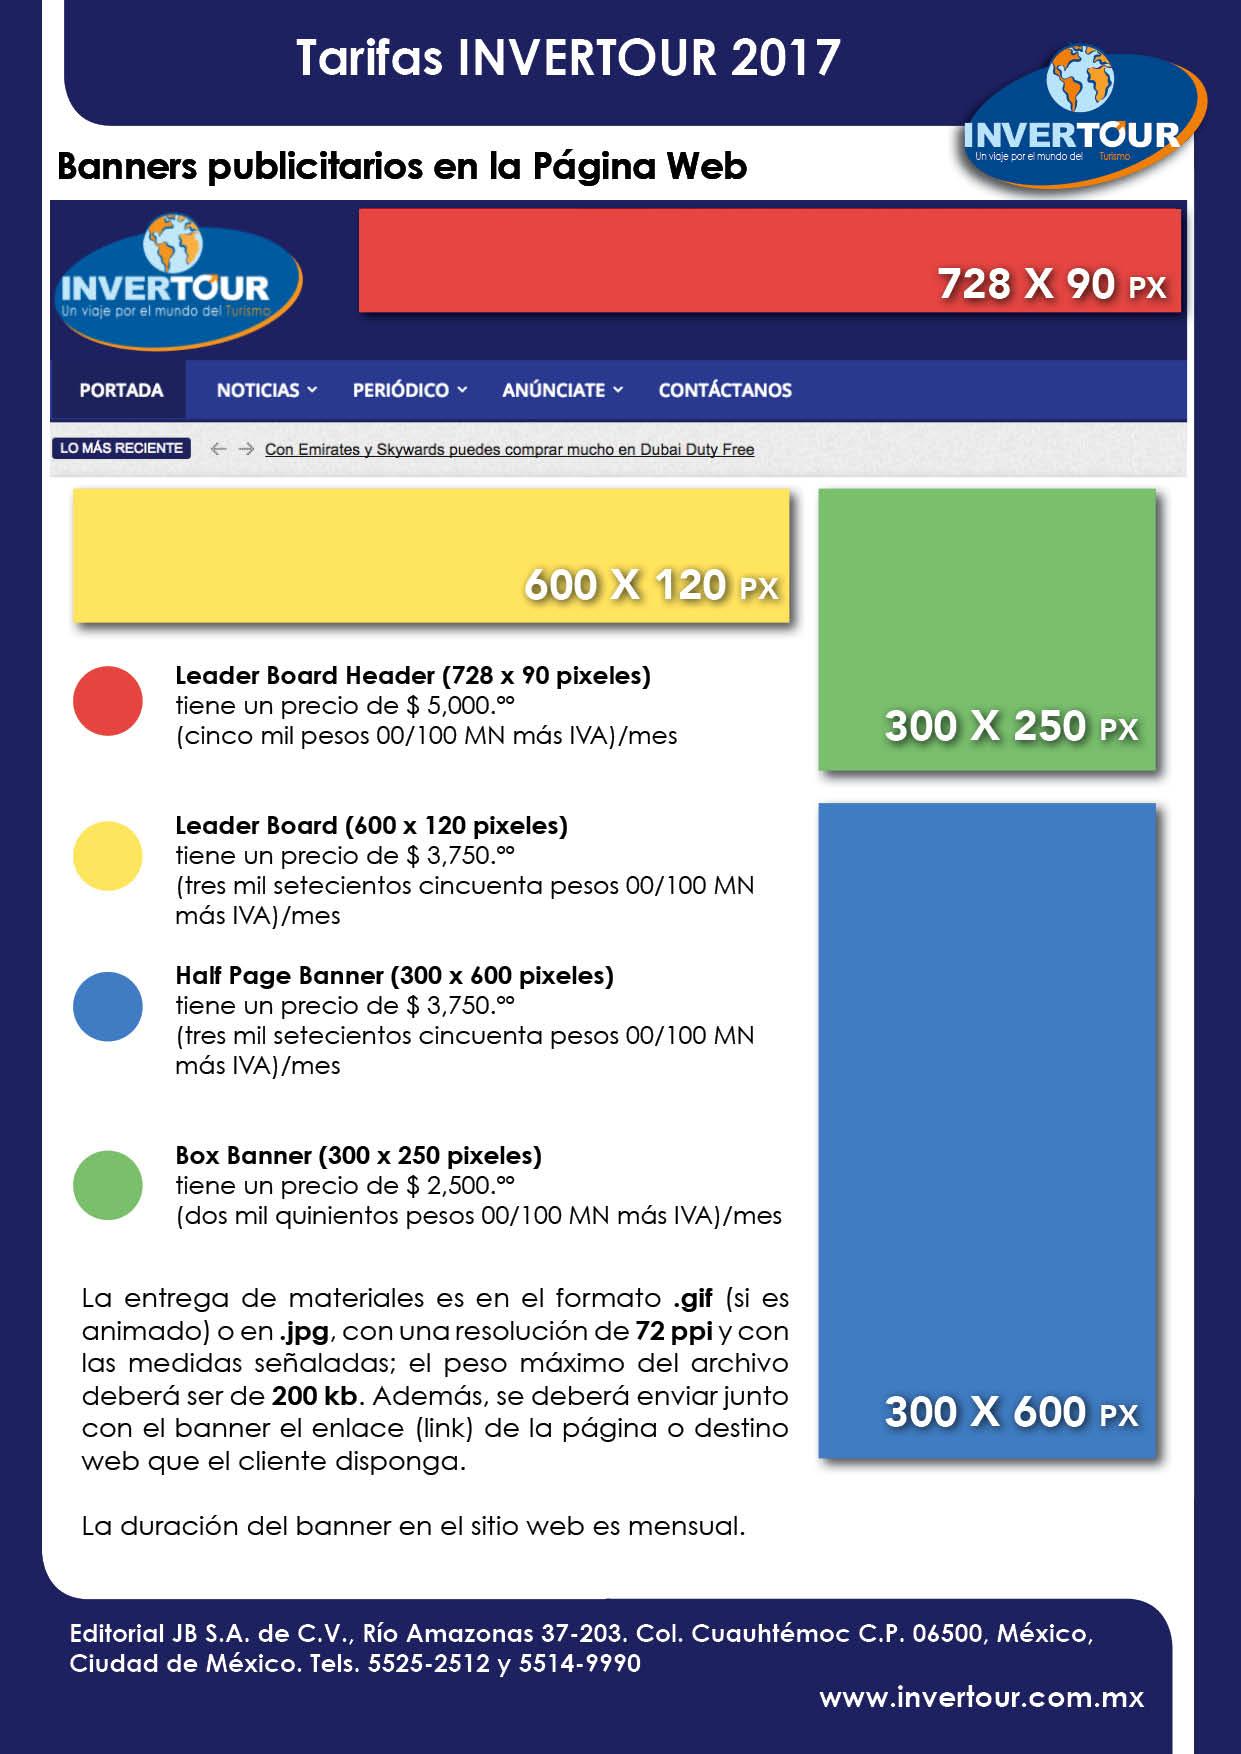 tarifas-invertour-paginaweb-2017-esppesosok